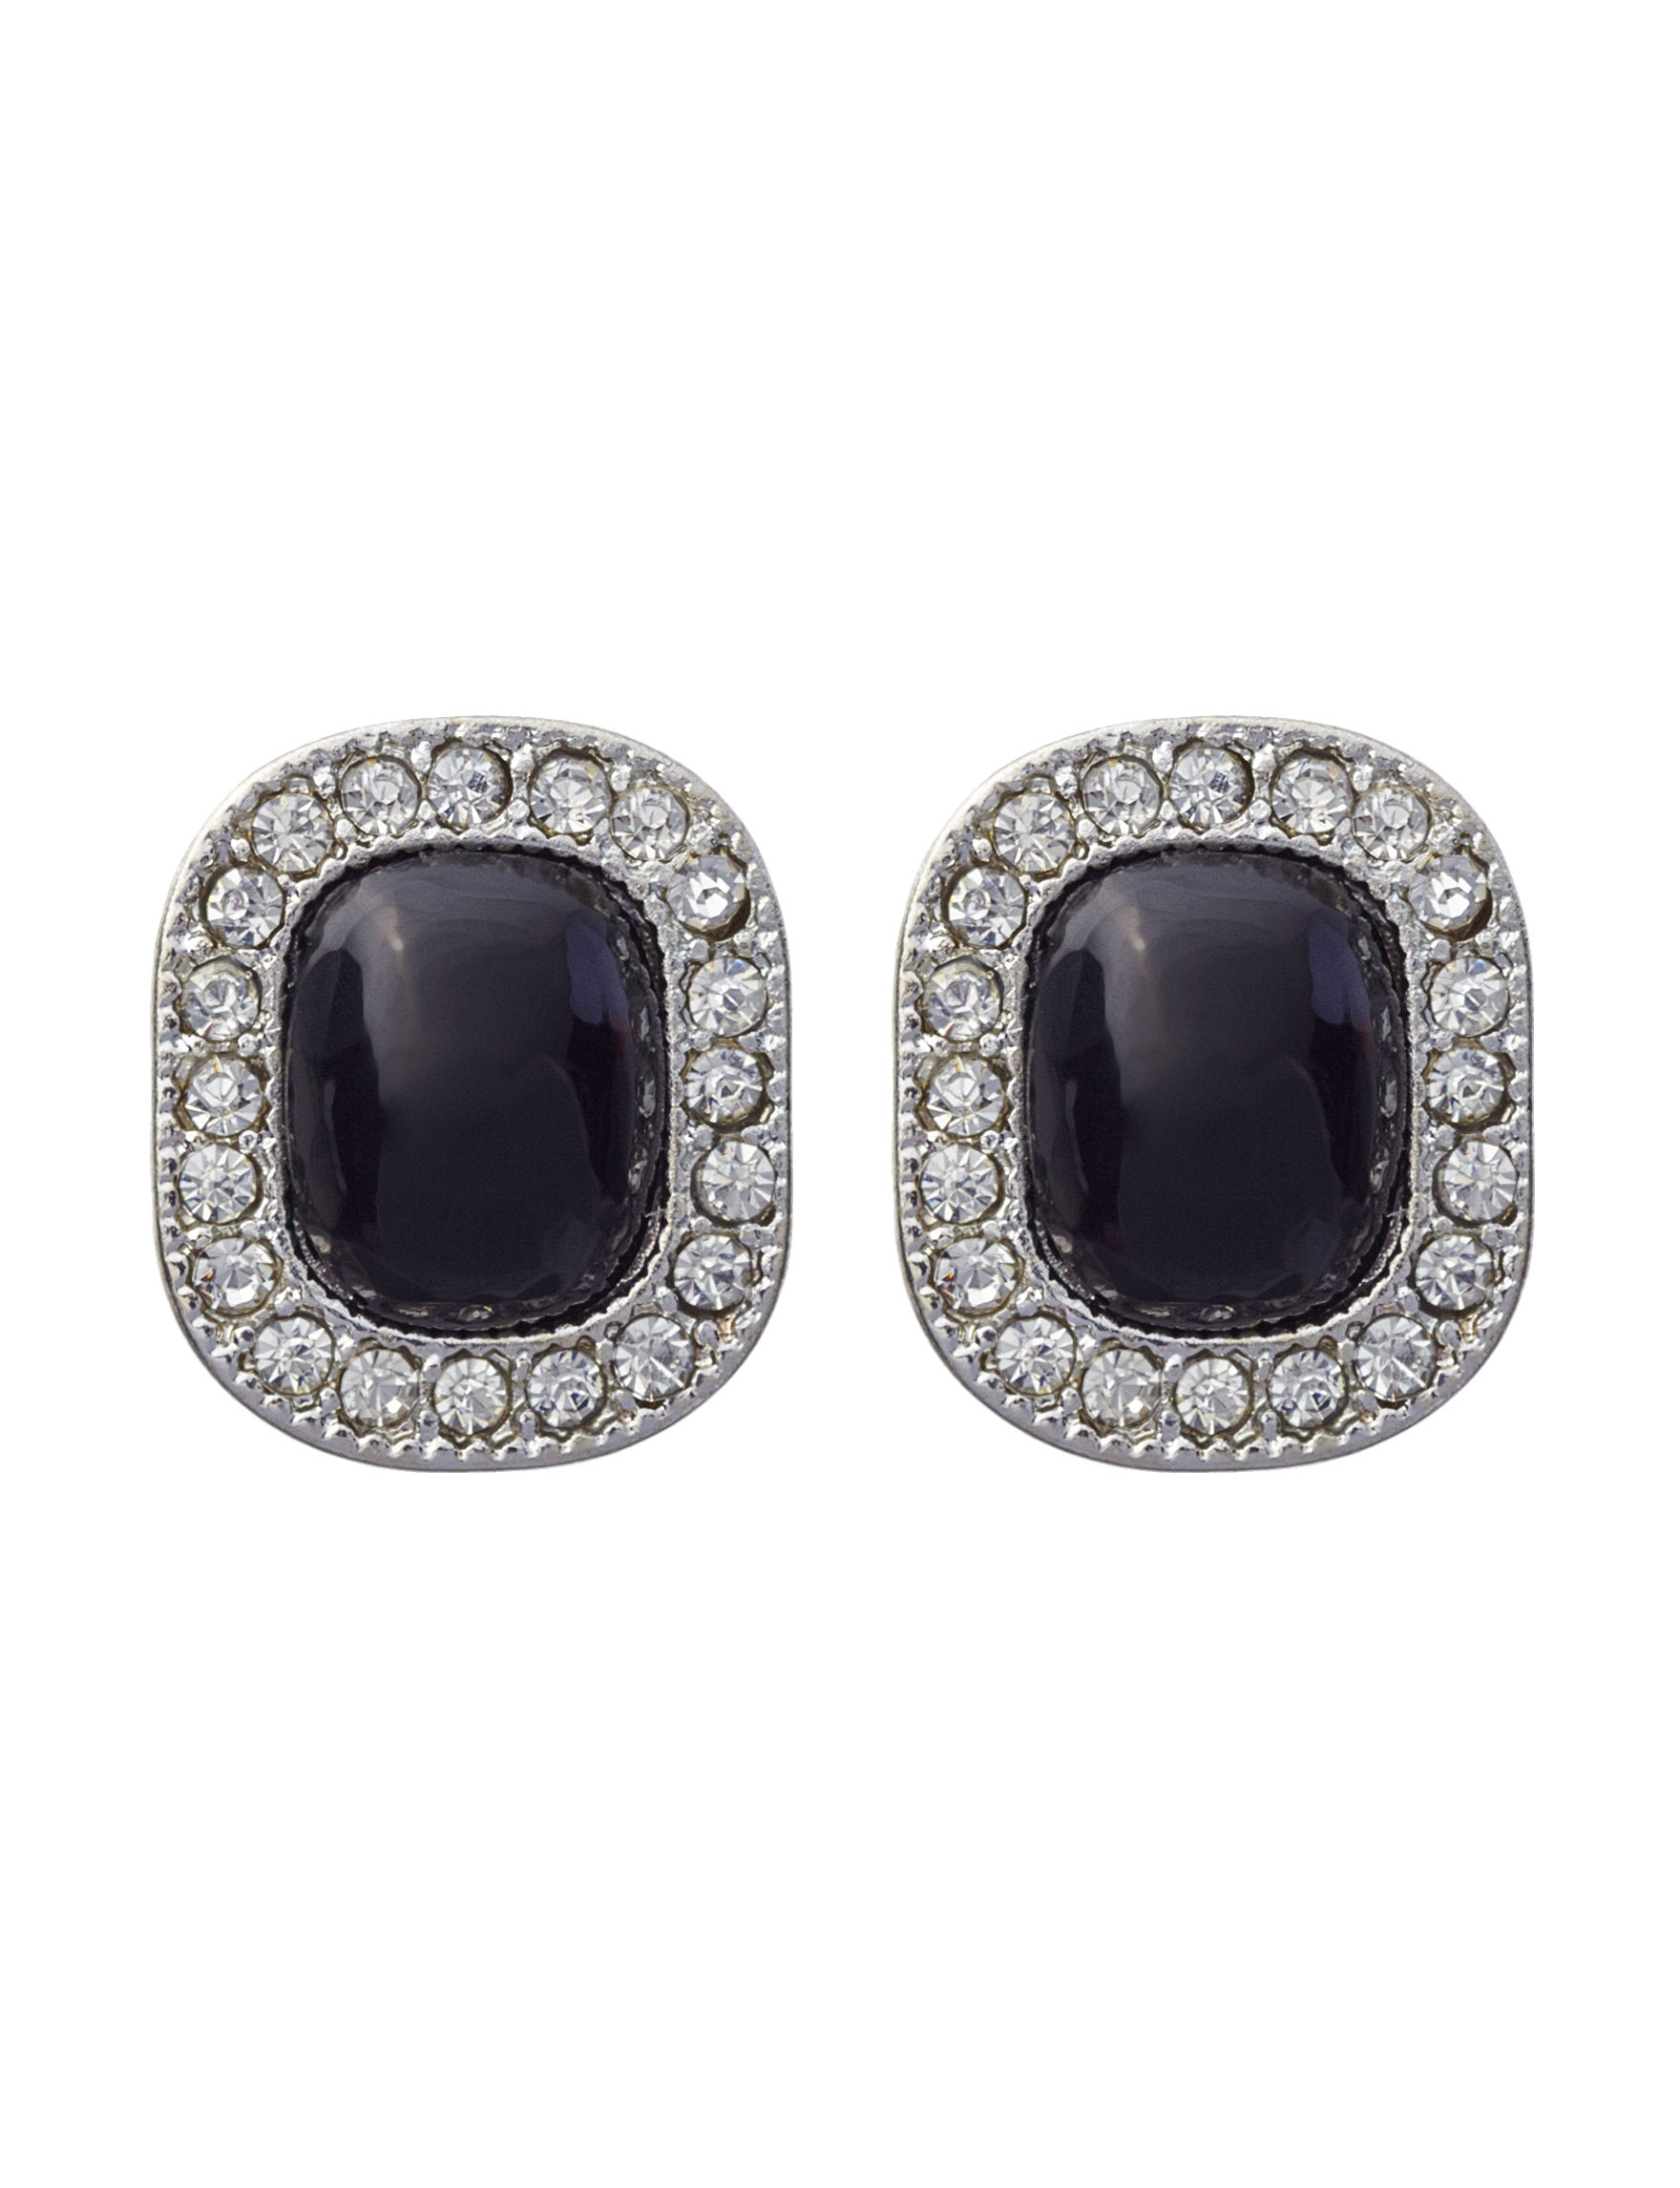 Hannah Black Studs Earrings Fashion Jewelry